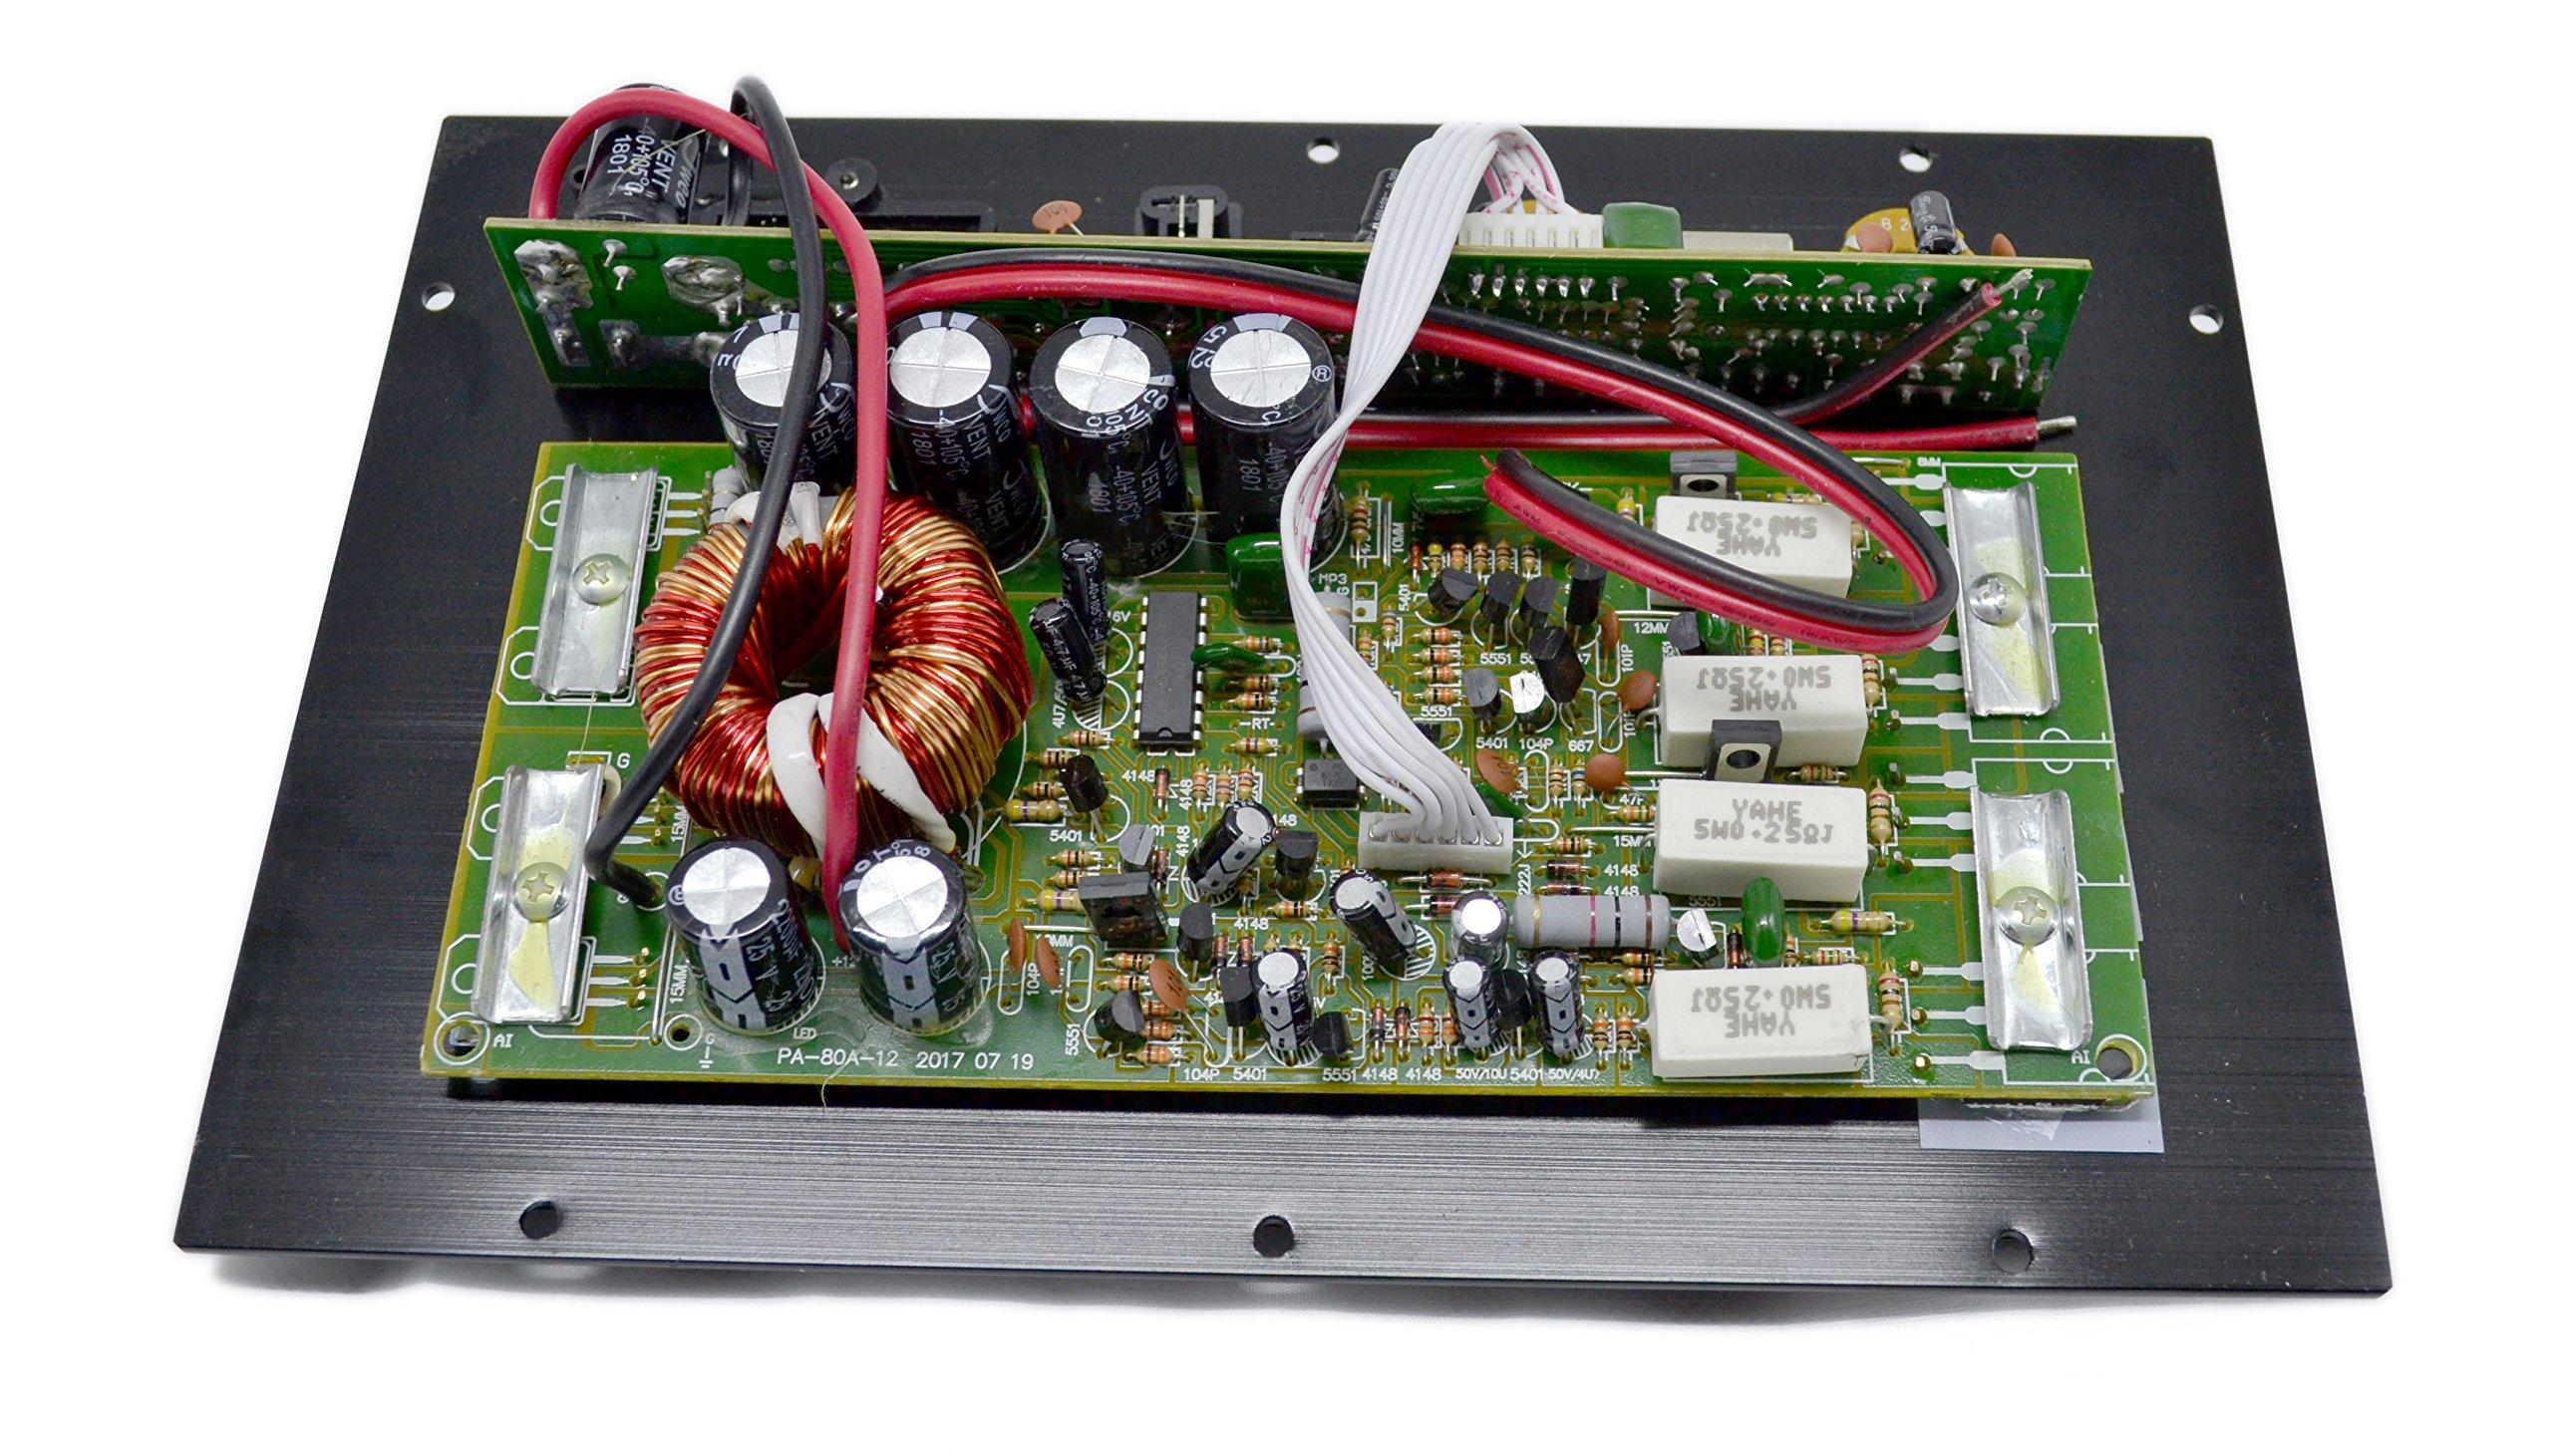 PA-80D Car Amplifie 1000W High Power Tube Amplifier Subwoofer Amplifier by bass audio (Image #4)